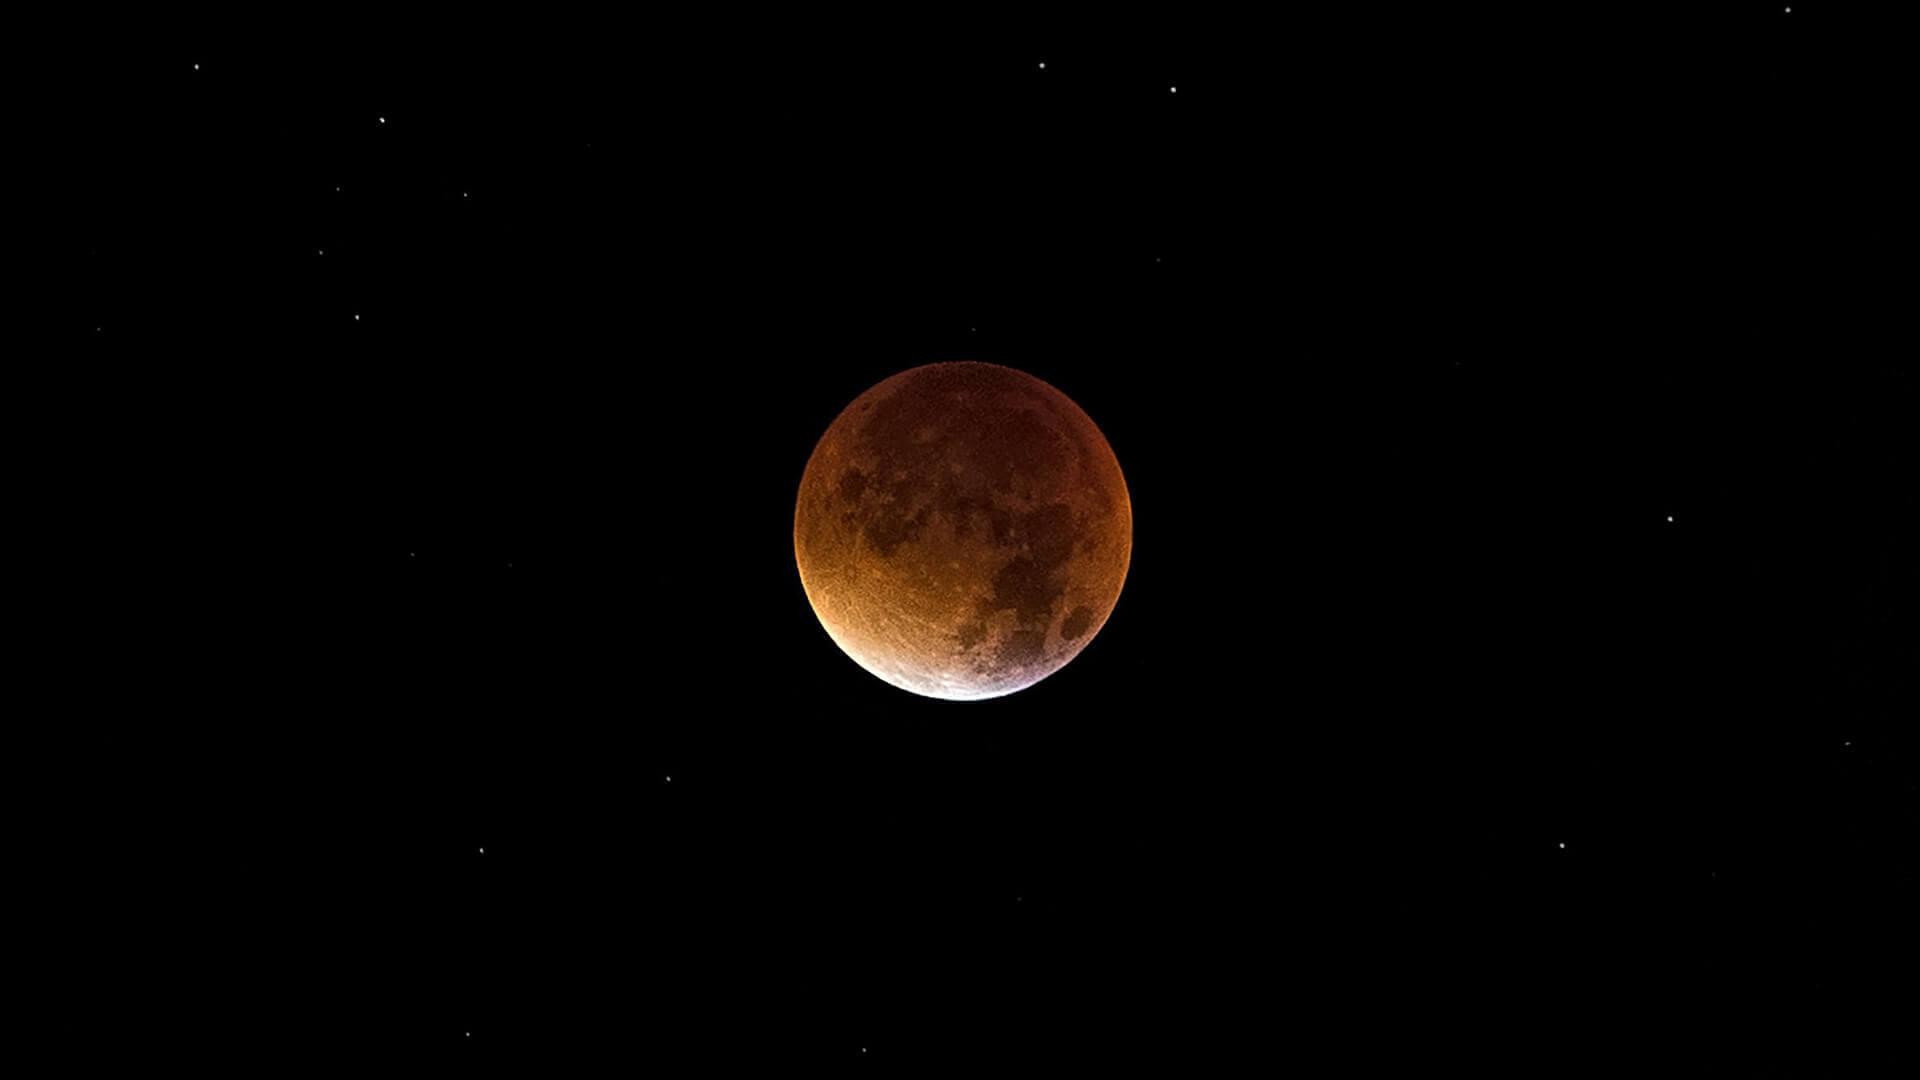 Super Full Moon Total Lunar Eclipse in Sagittarius - Moon Omens - May 26 2021